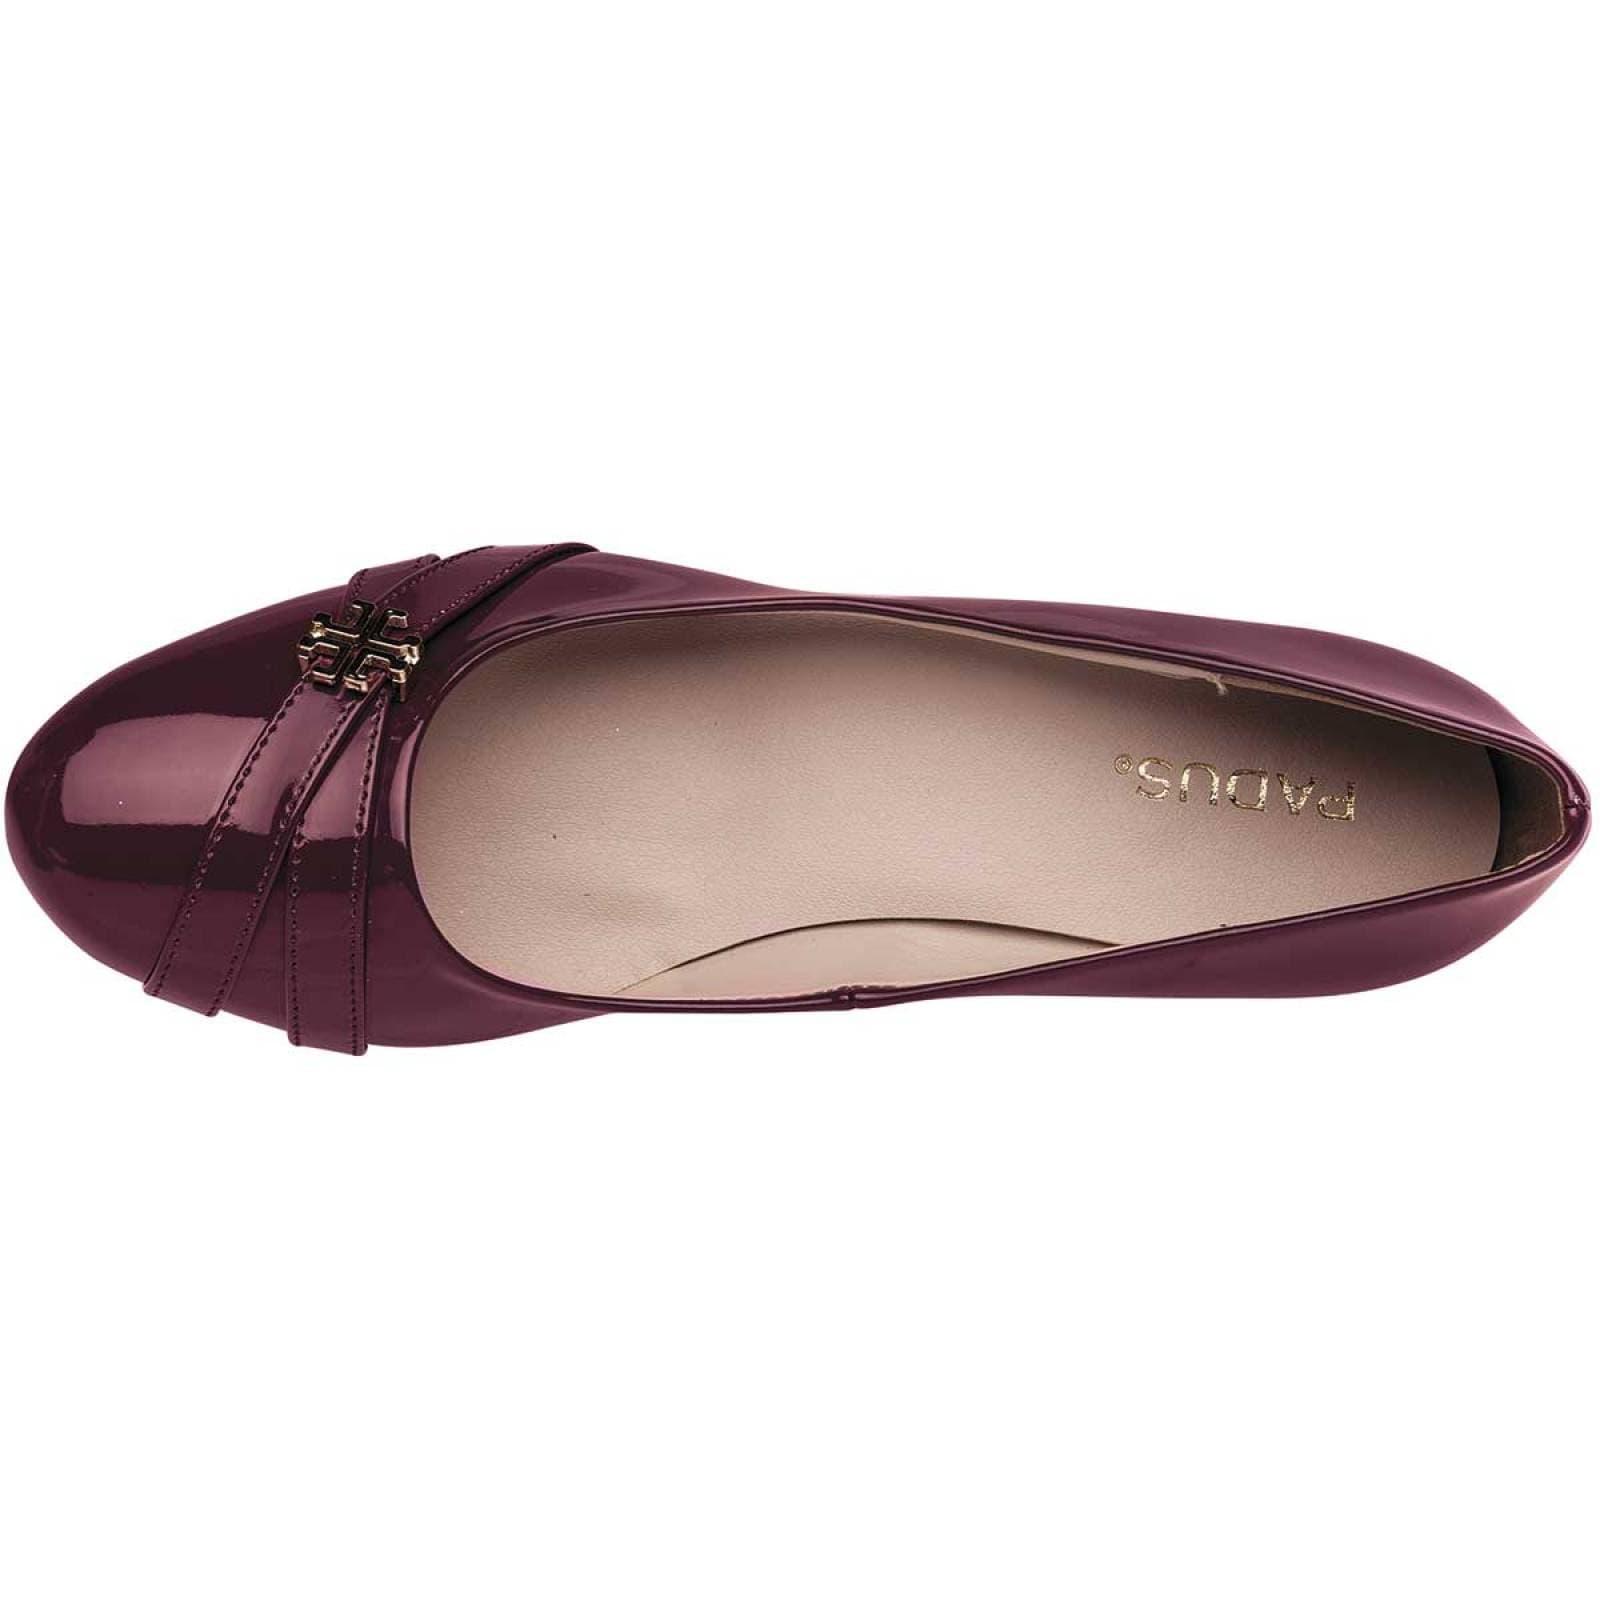 Padus Zapato Mujer Vino charol